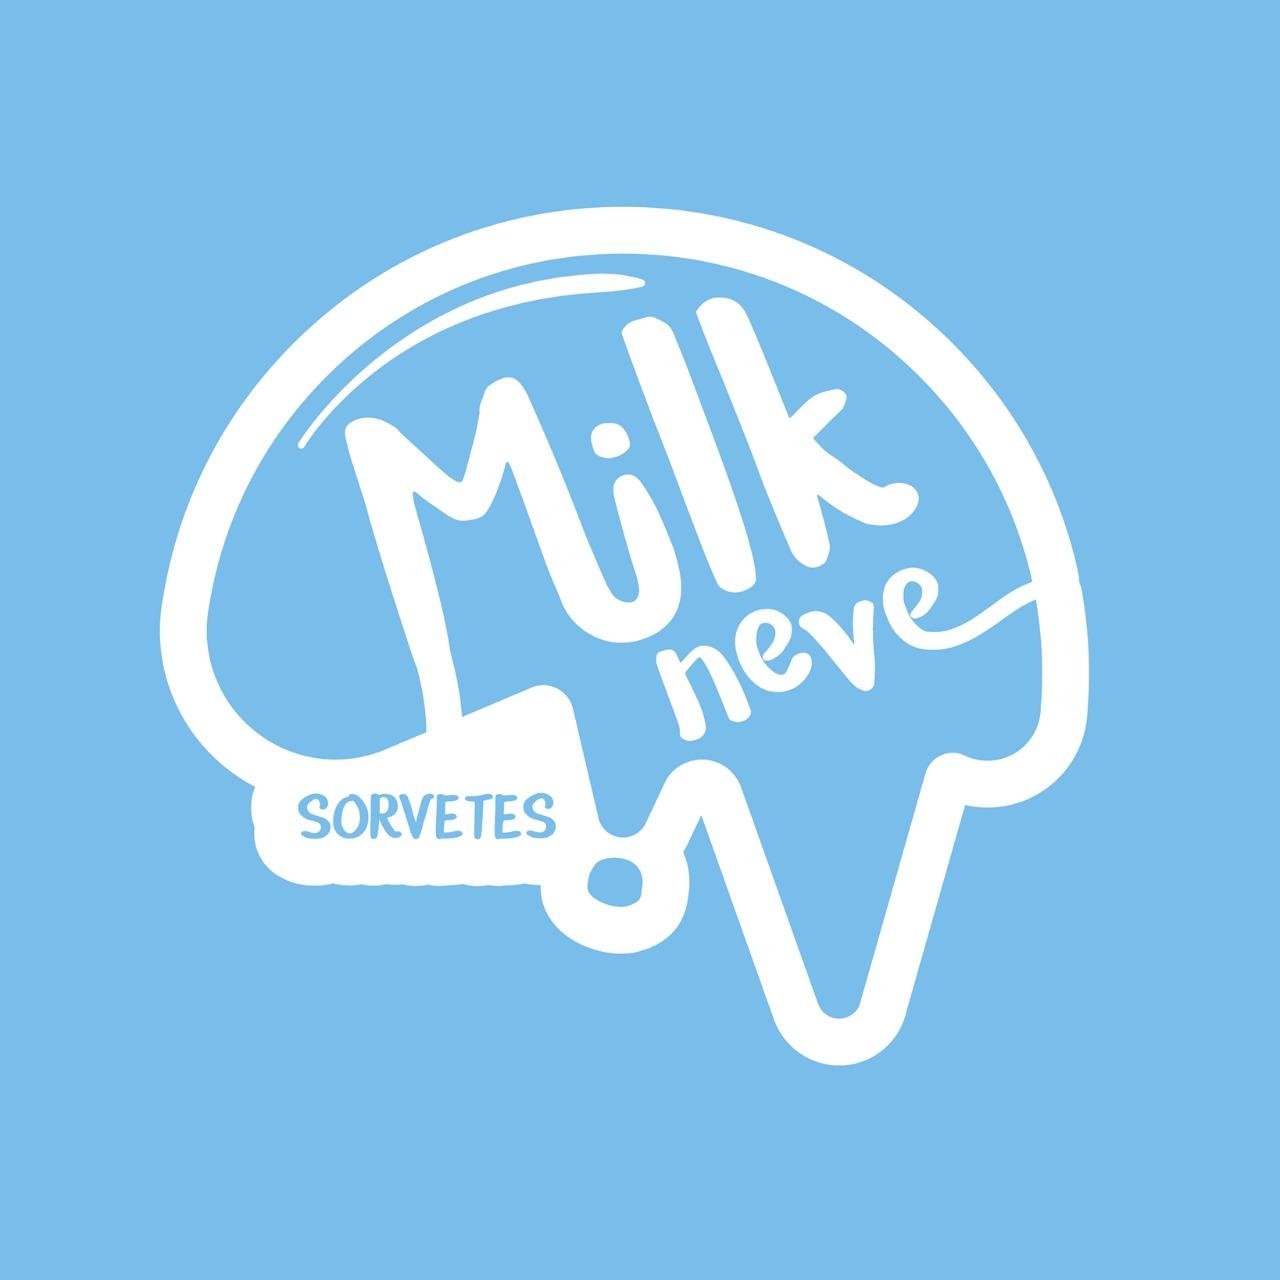 Sorveteria Milkneve - Engenheiro Beltrão